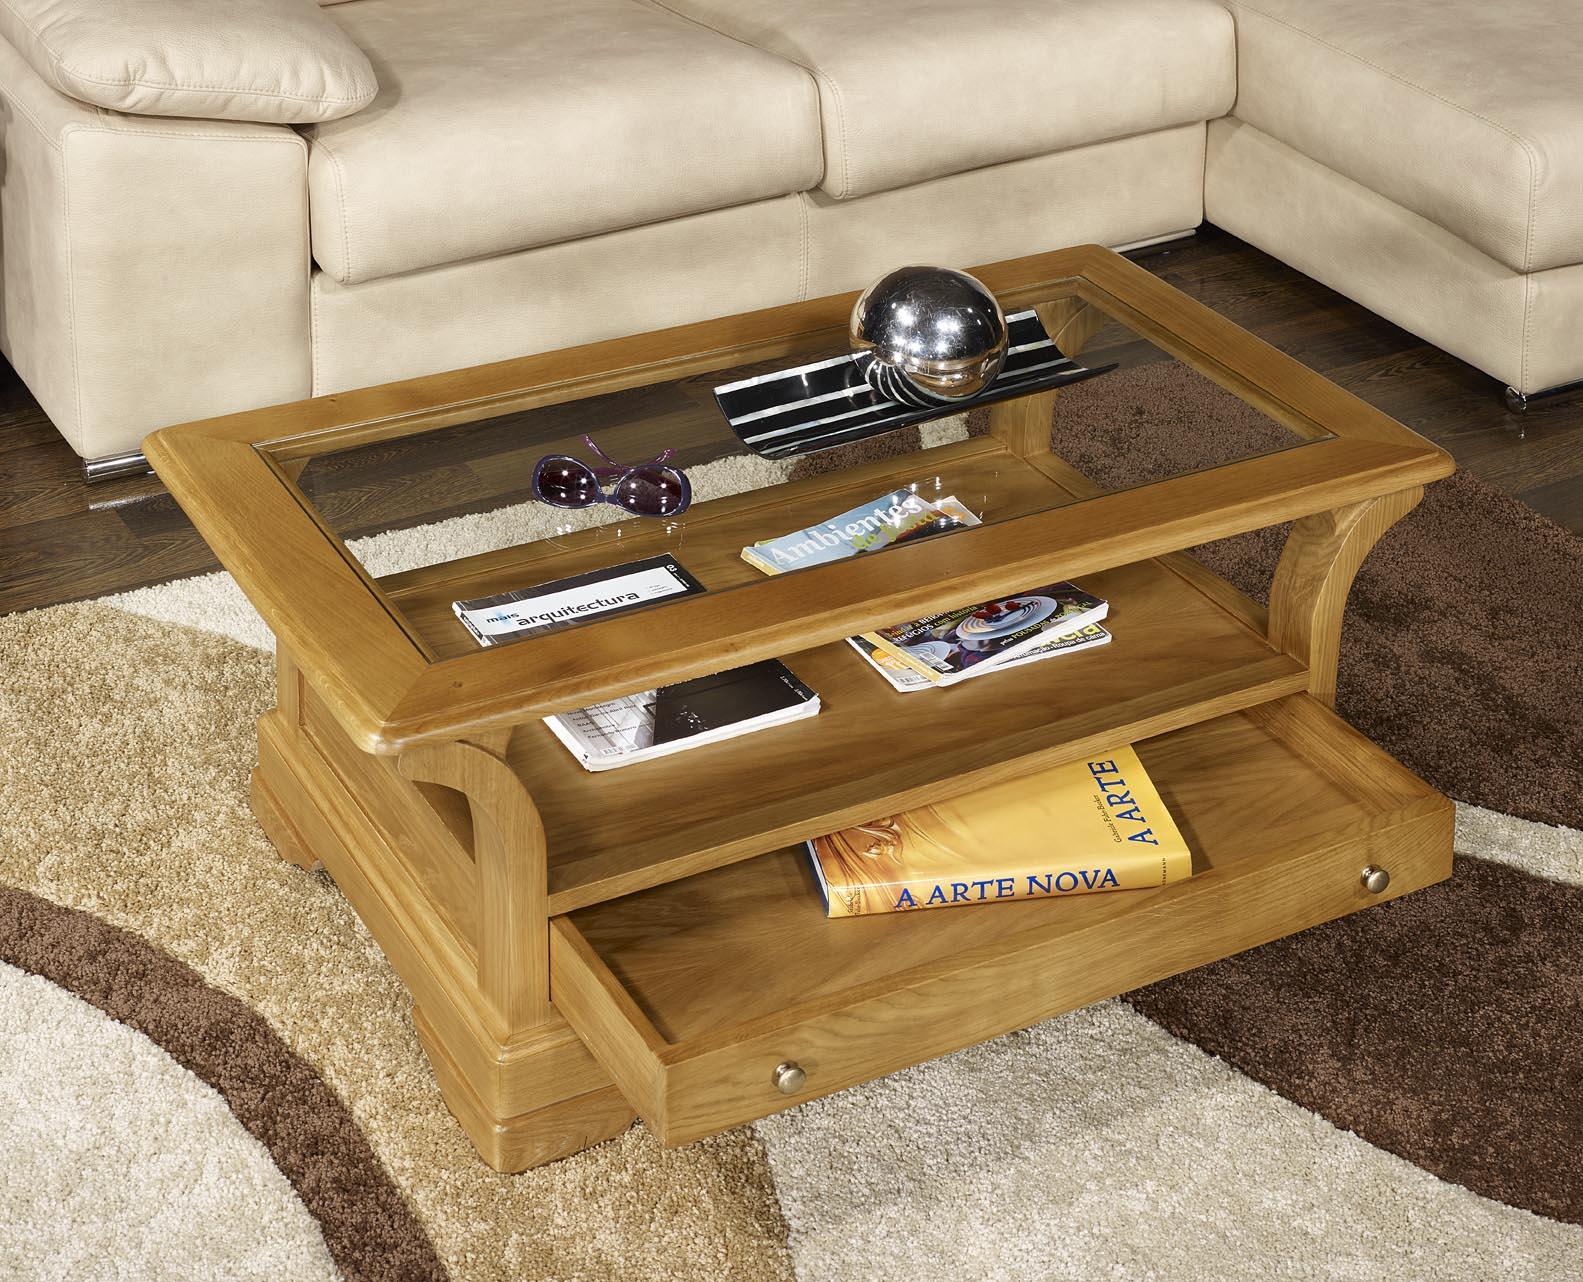 table basse raphael en ch ne massif de style louis philippe meuble en ch ne massif. Black Bedroom Furniture Sets. Home Design Ideas